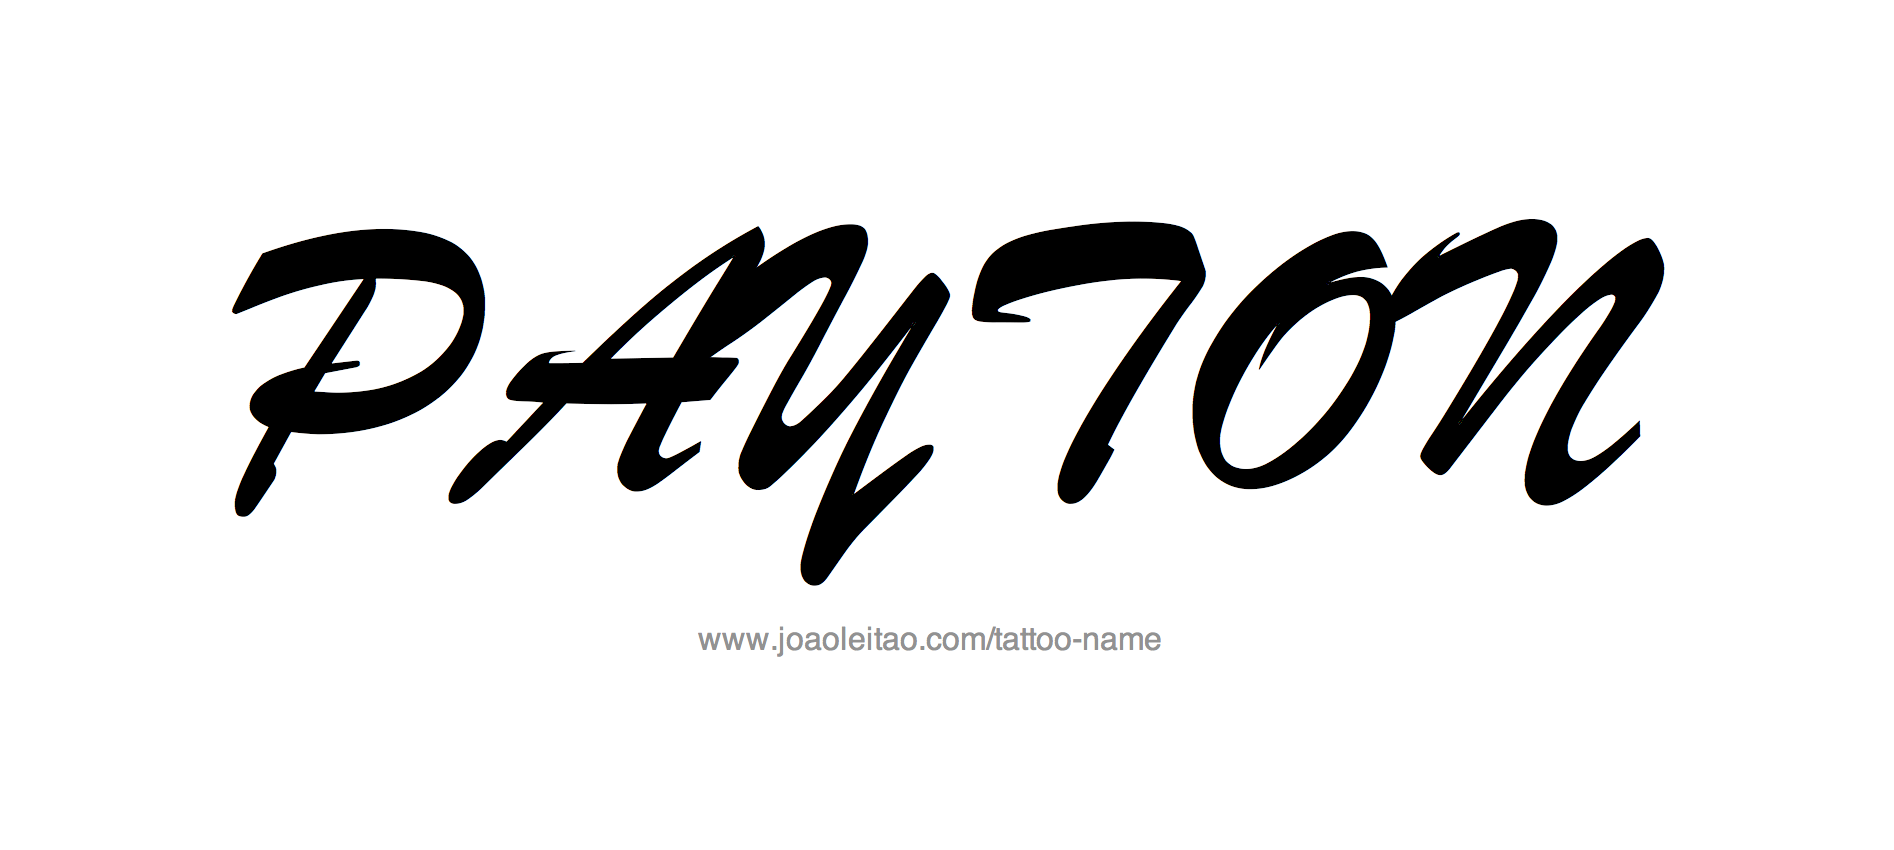 payton name tattoo designs. Black Bedroom Furniture Sets. Home Design Ideas